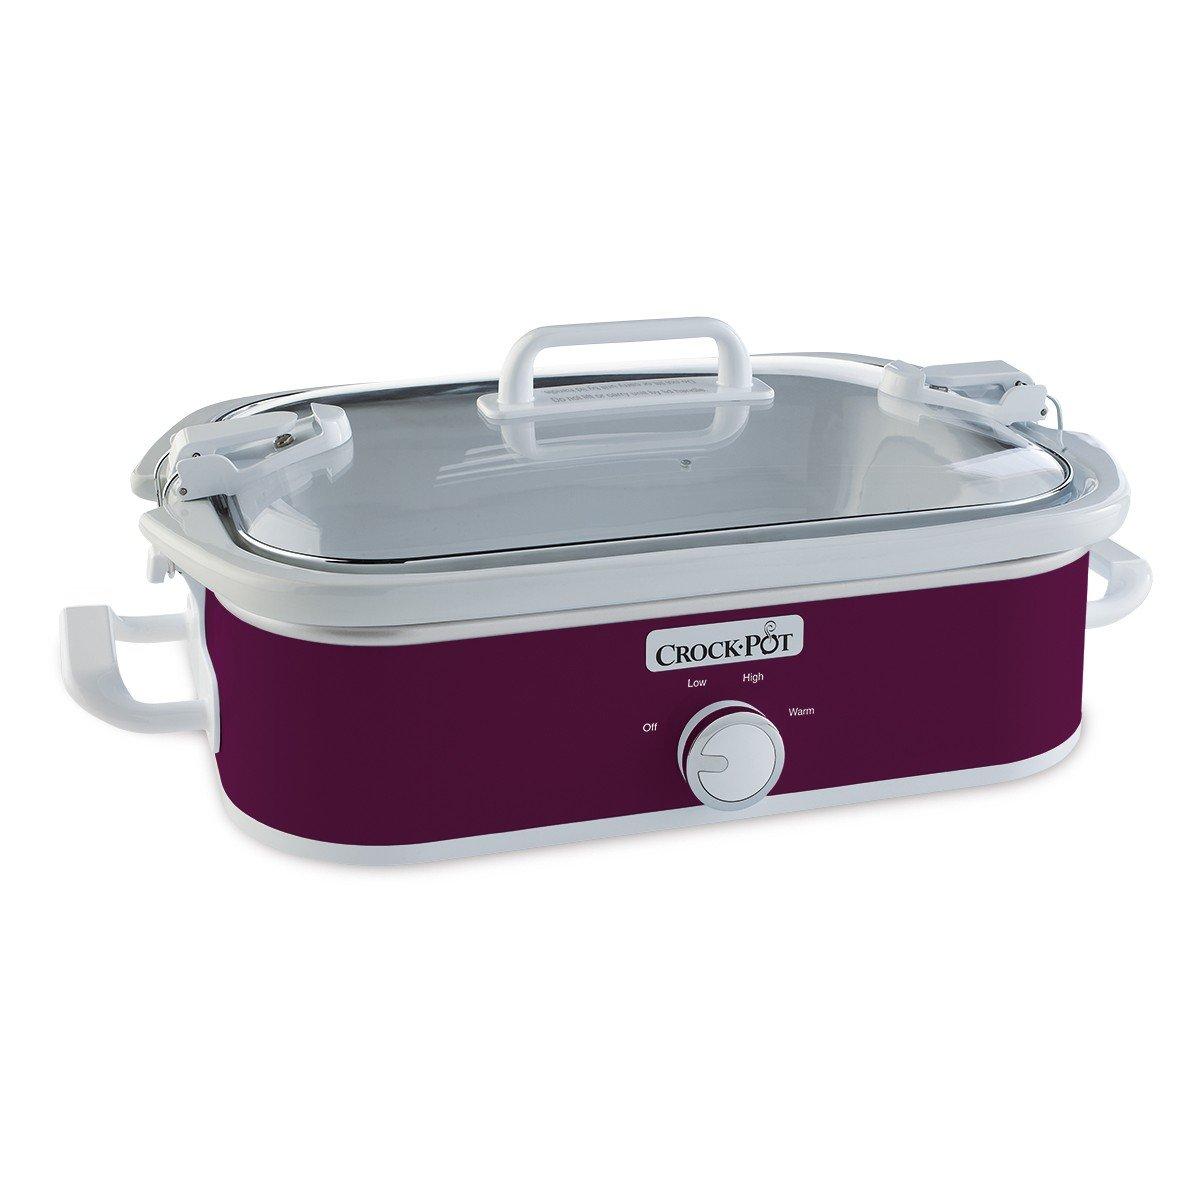 Crock-Pot 3.5-Quart Casserole Crock Manual Slow Cooker, Perfect Plum